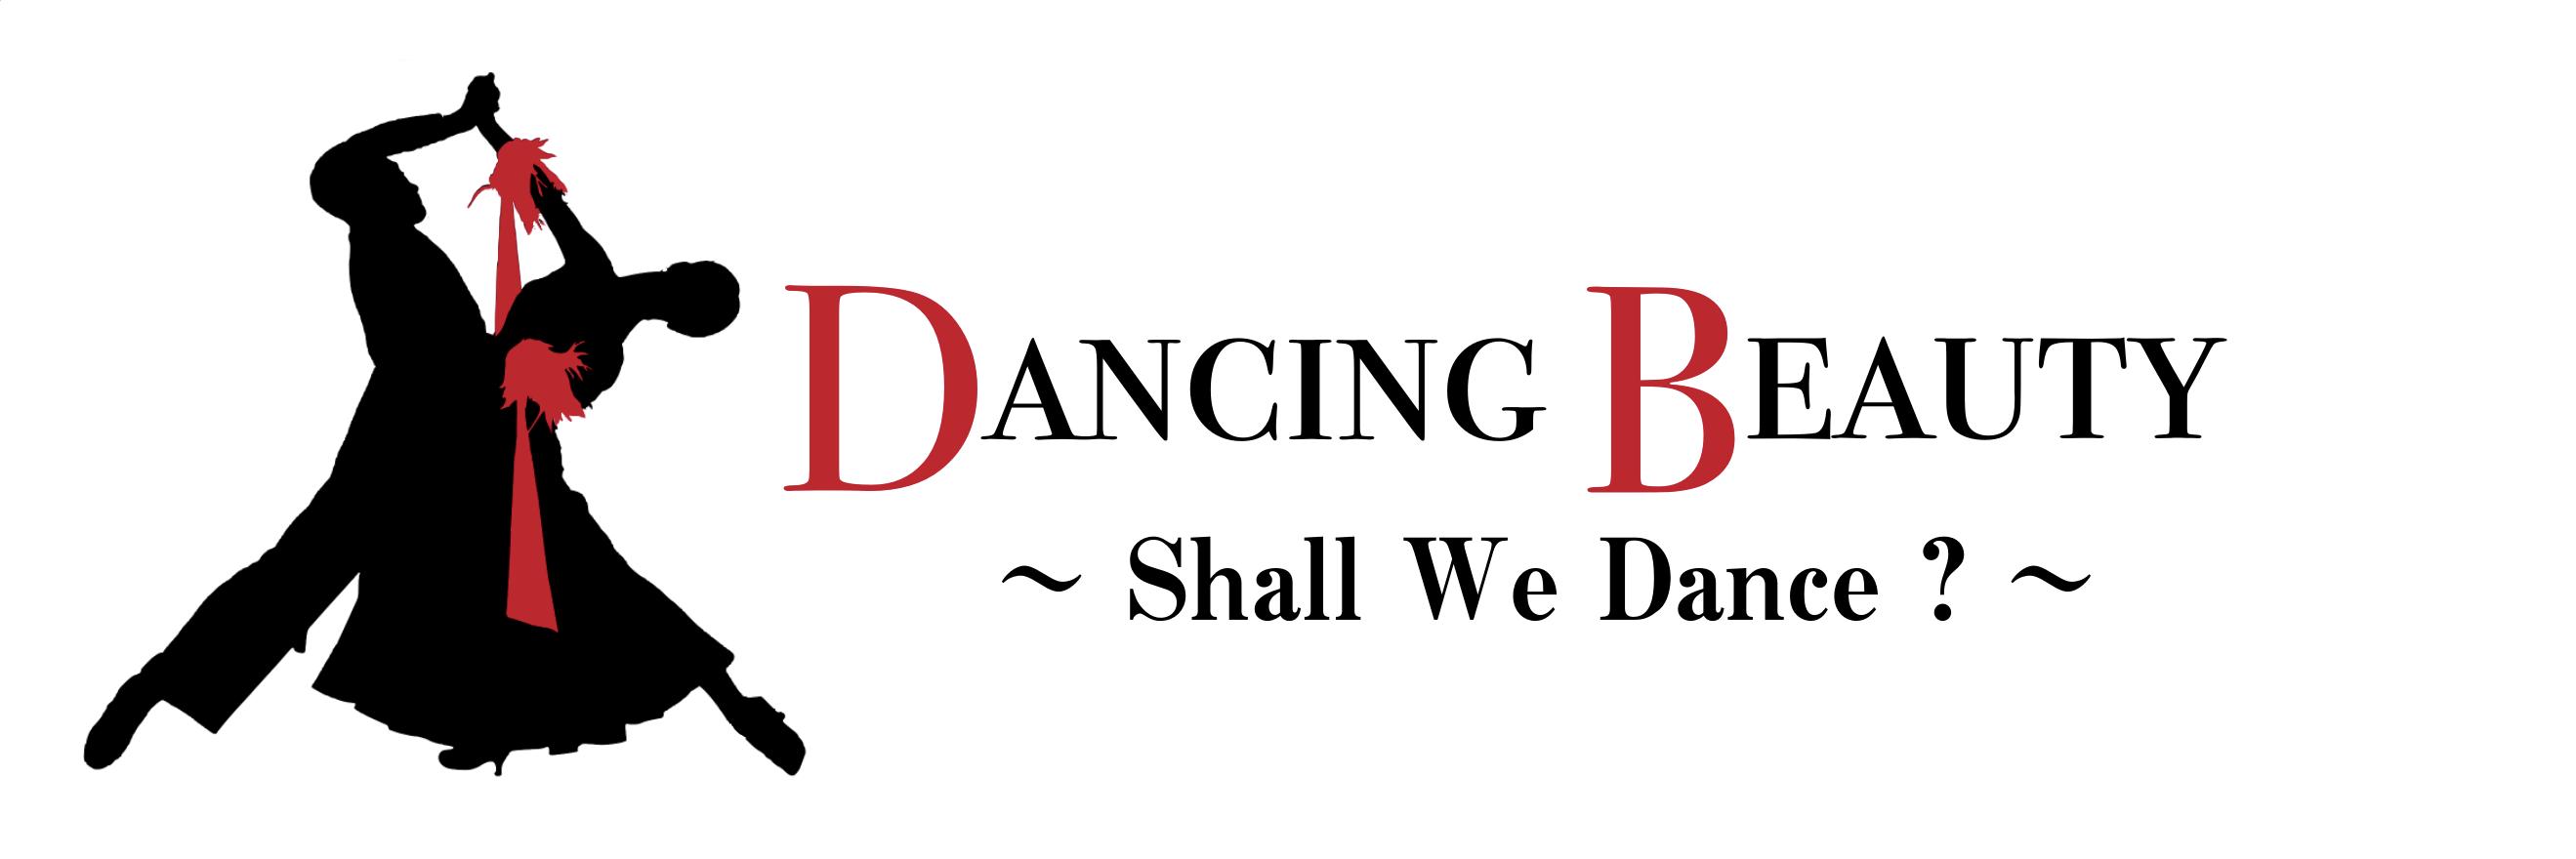 Dancing Beauty(ダンシングビューティー)